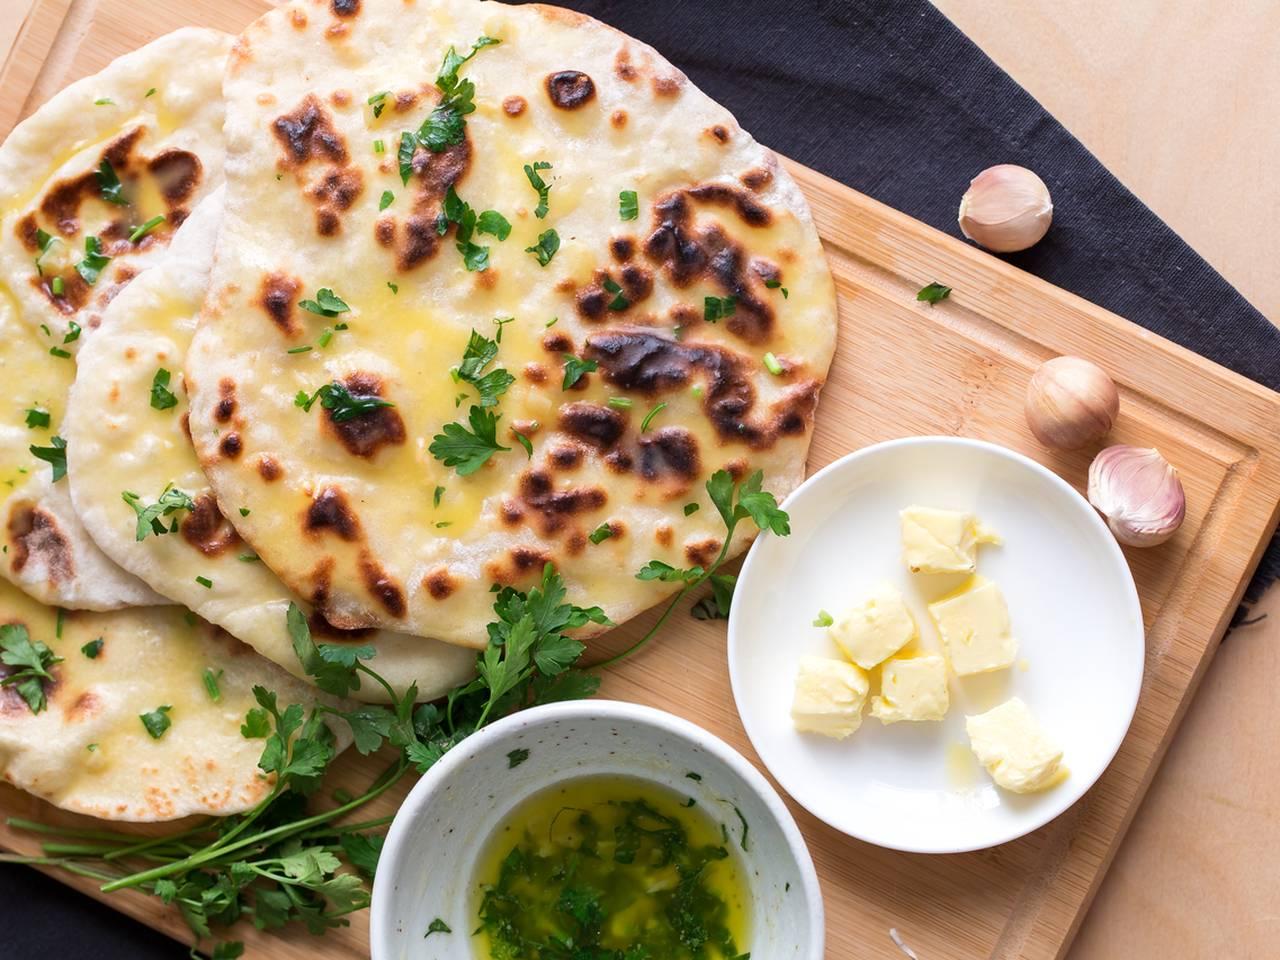 Warm Indian Garlic Naan With Pan